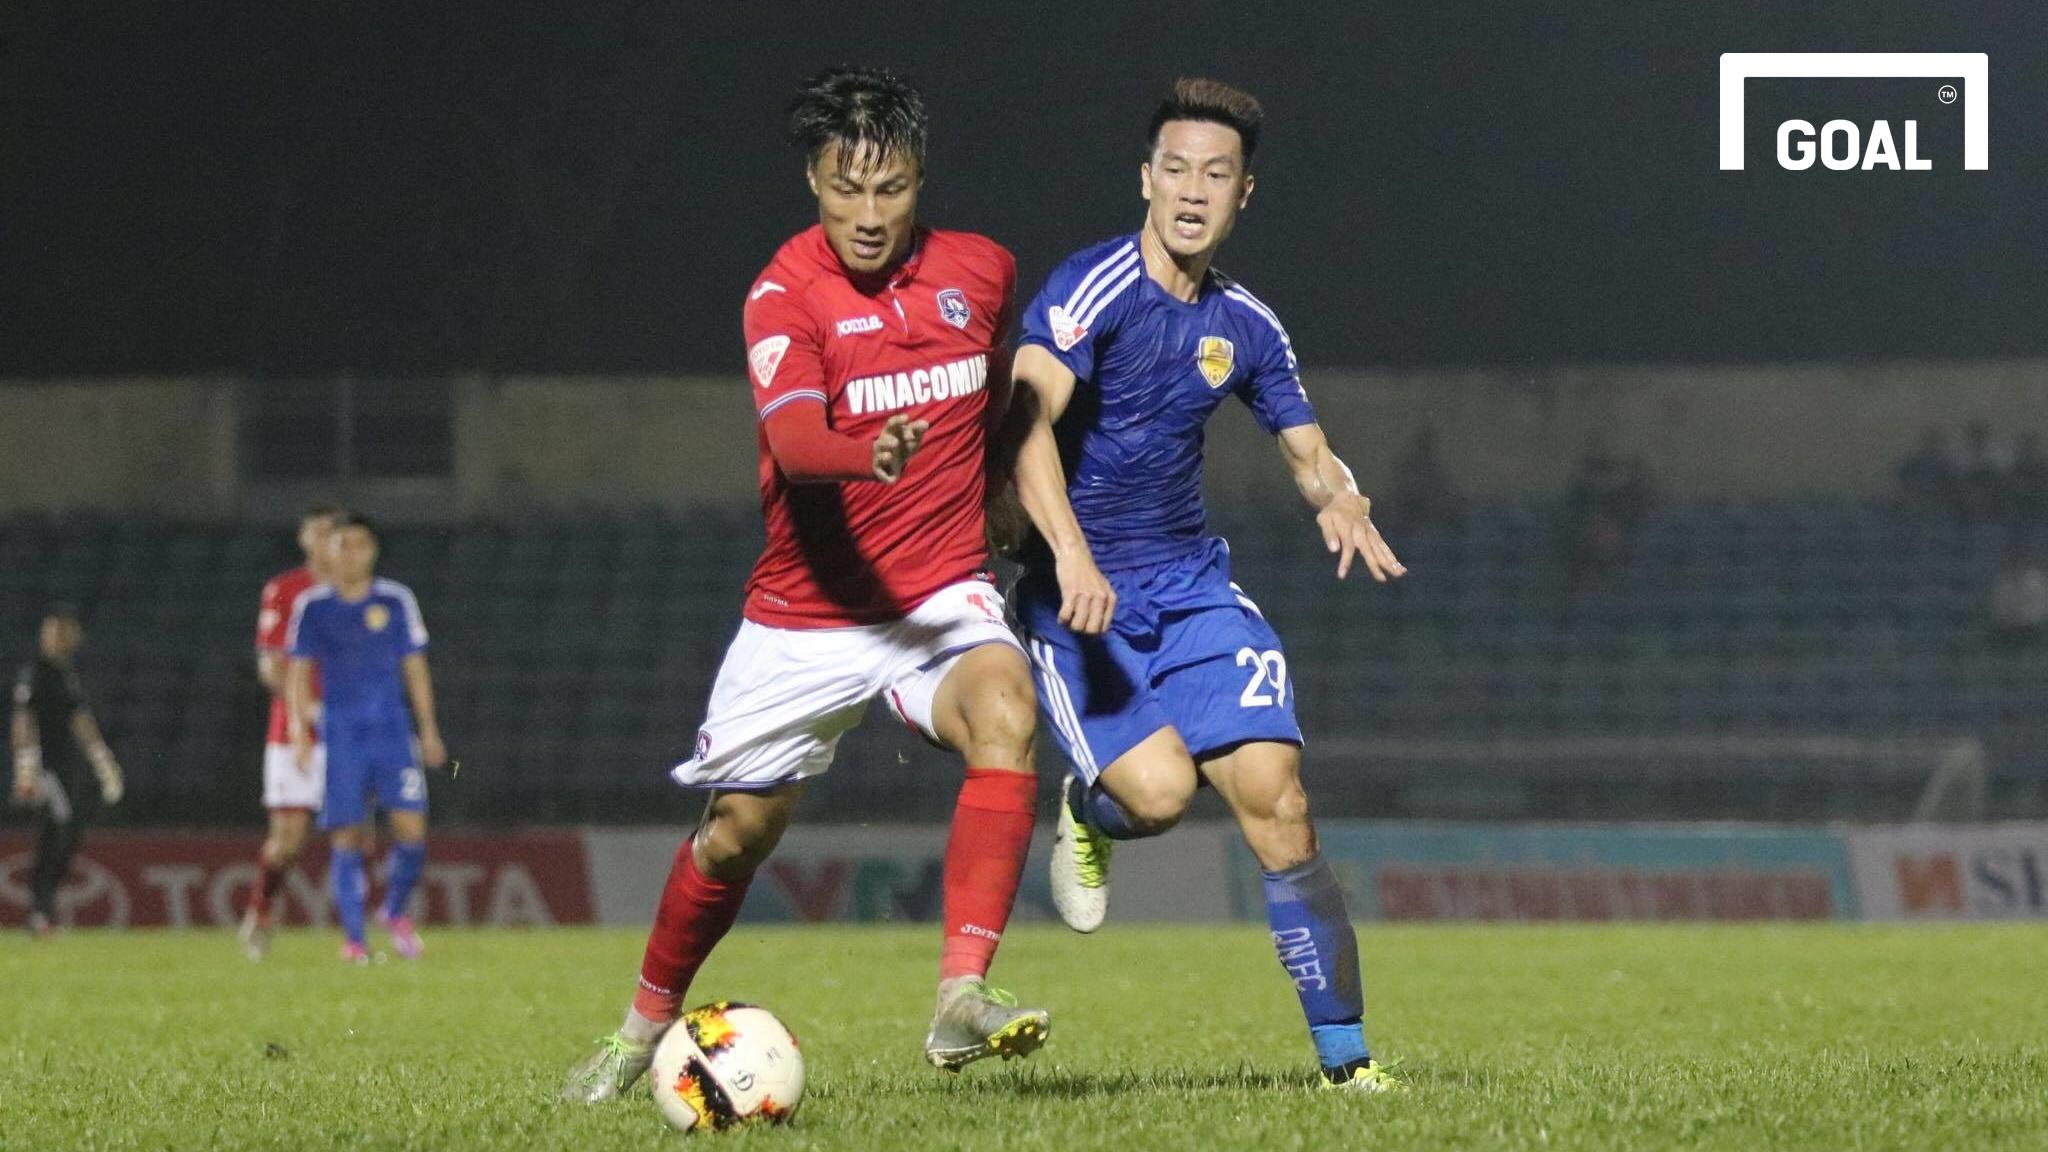 Quảng Nam vs Quảng Ninh